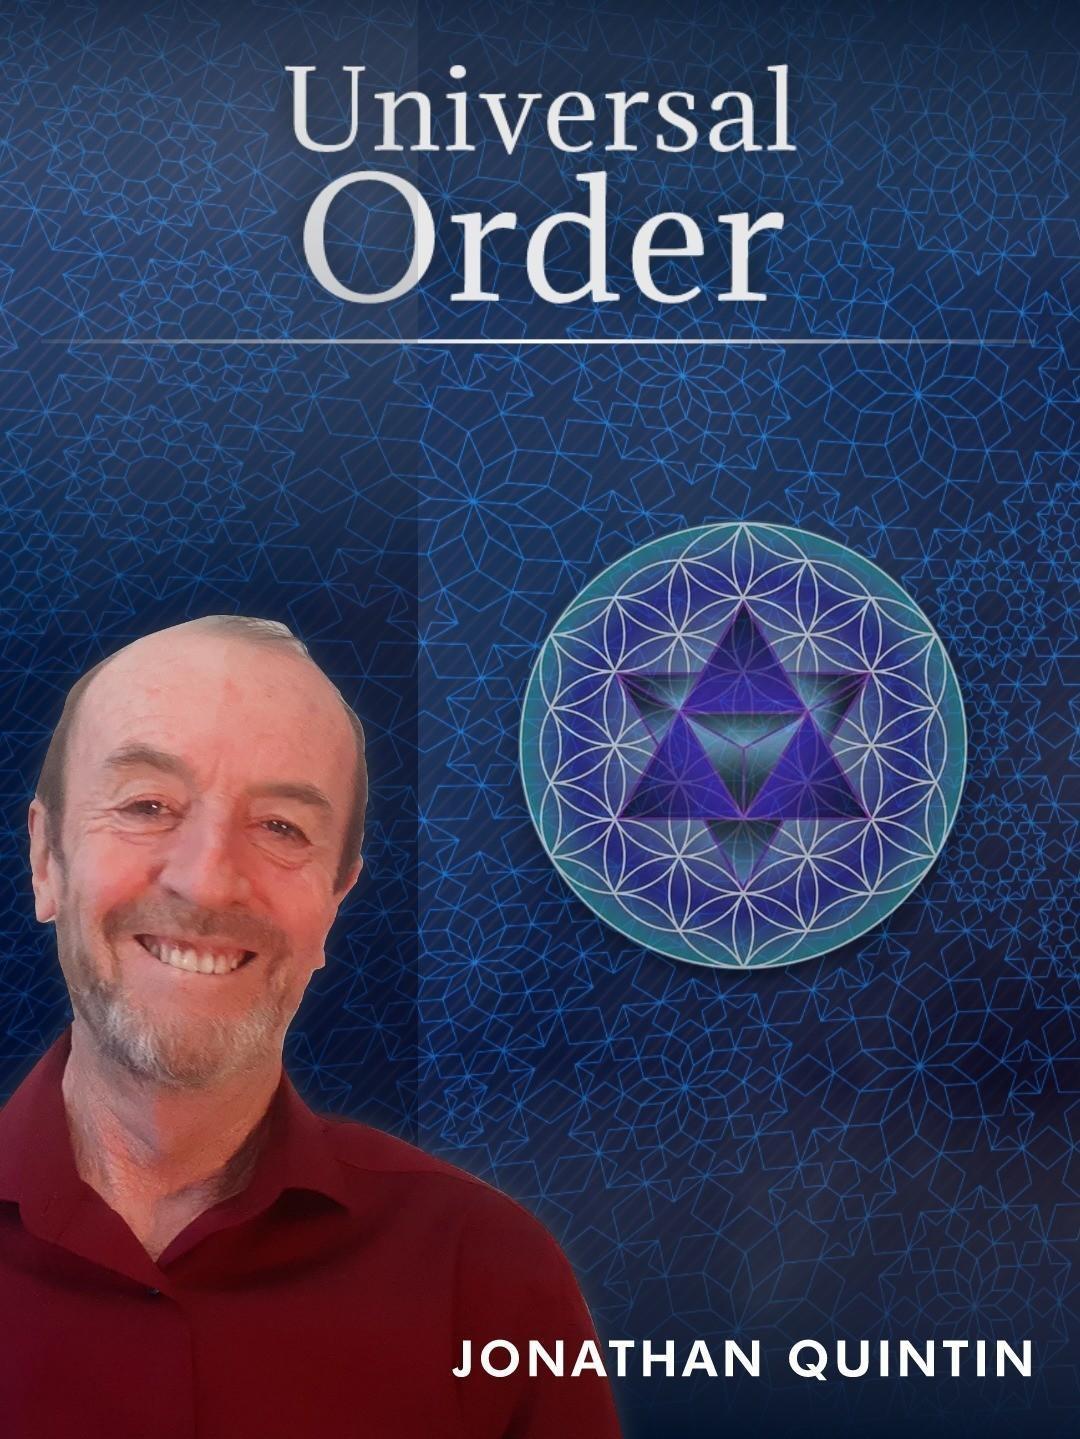 Universal Order